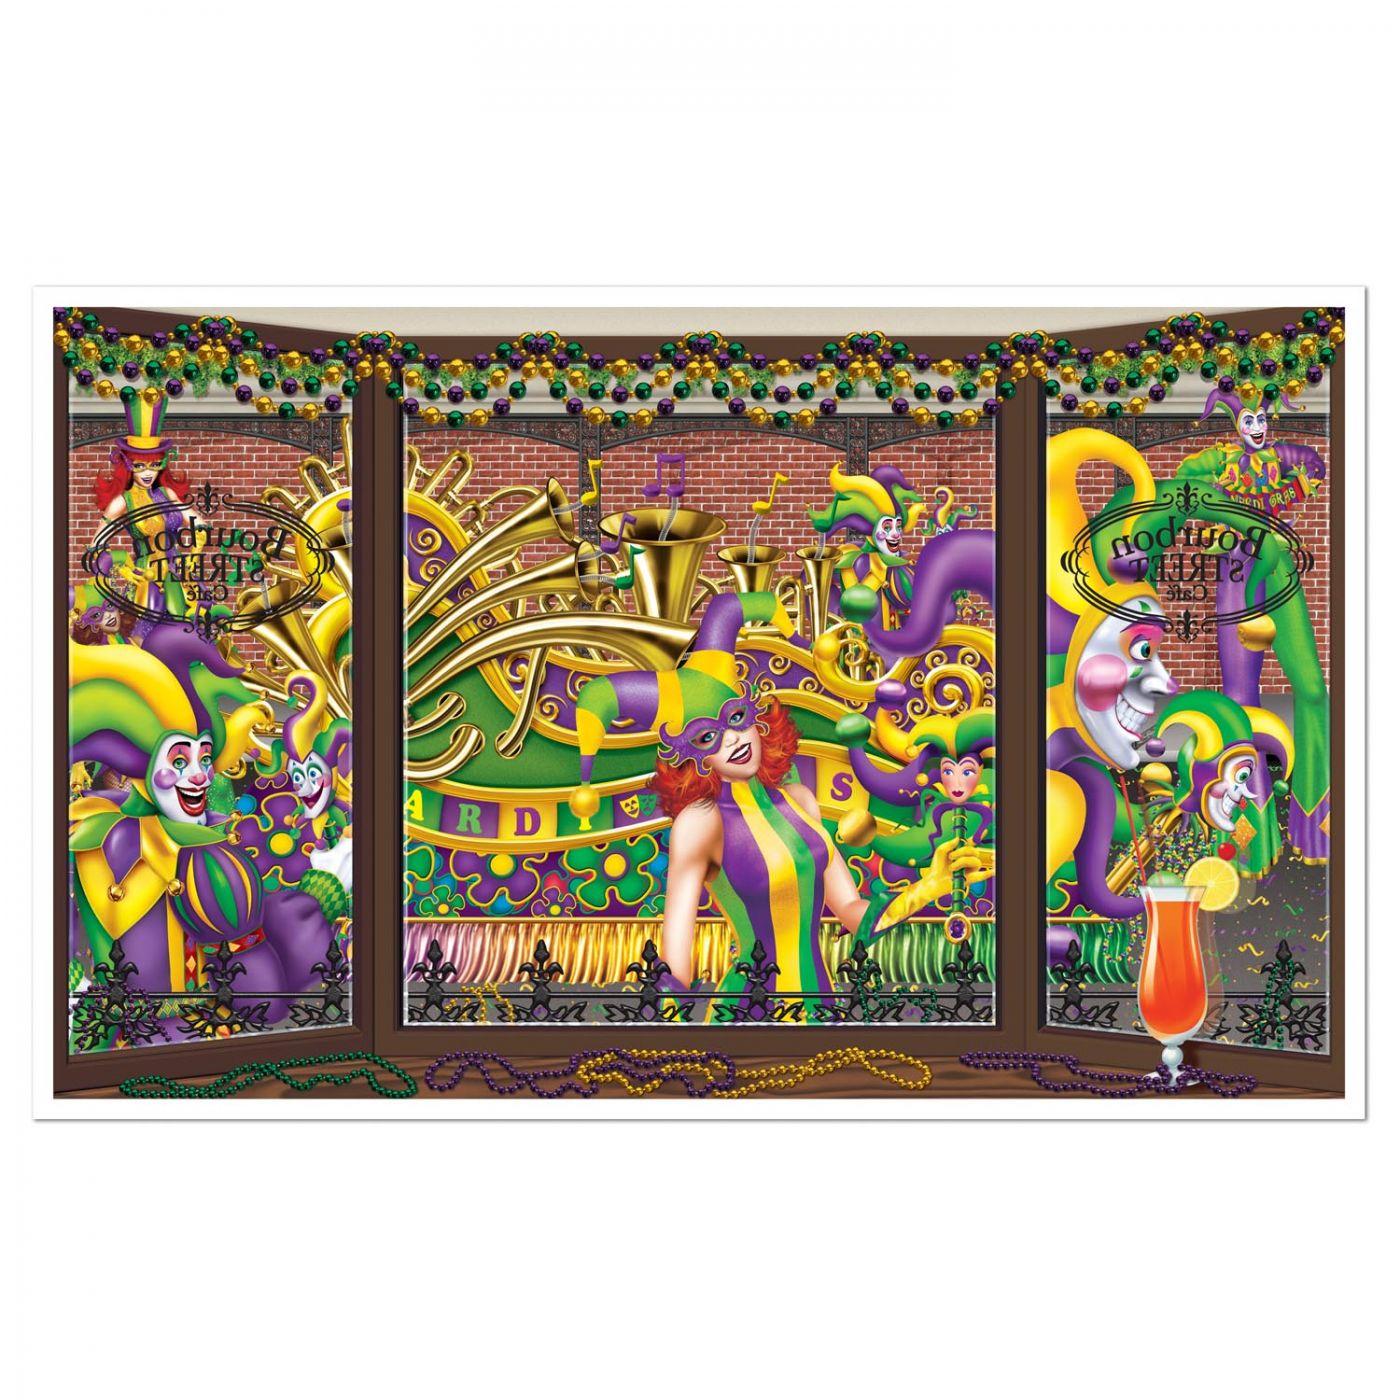 Mardi Gras Insta-View (6) image